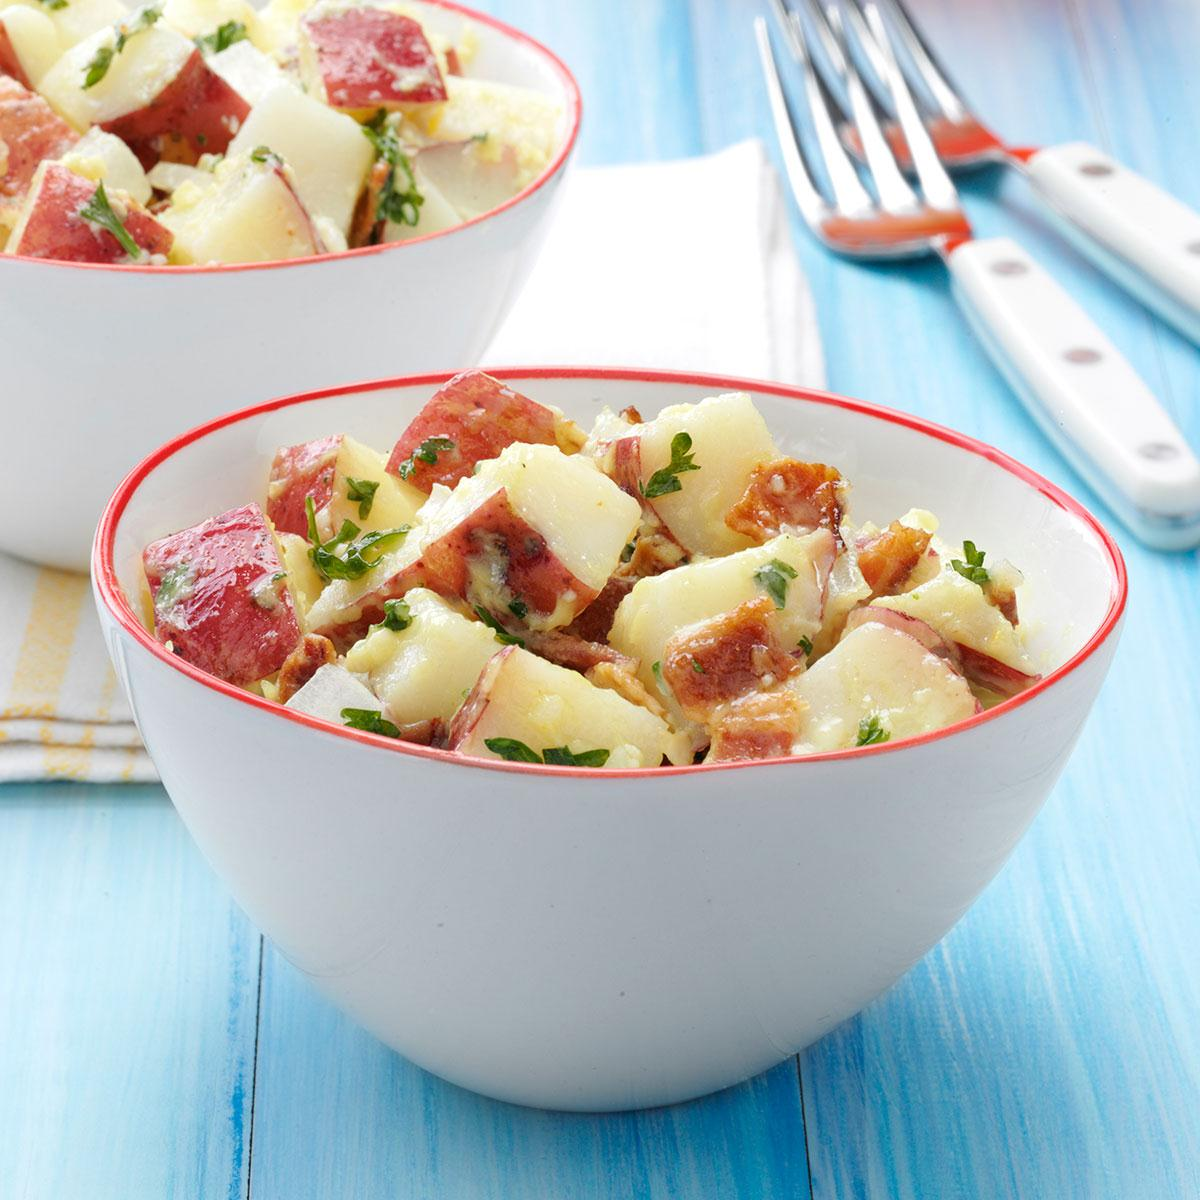 Best Potato Salad Recipe With Bacon